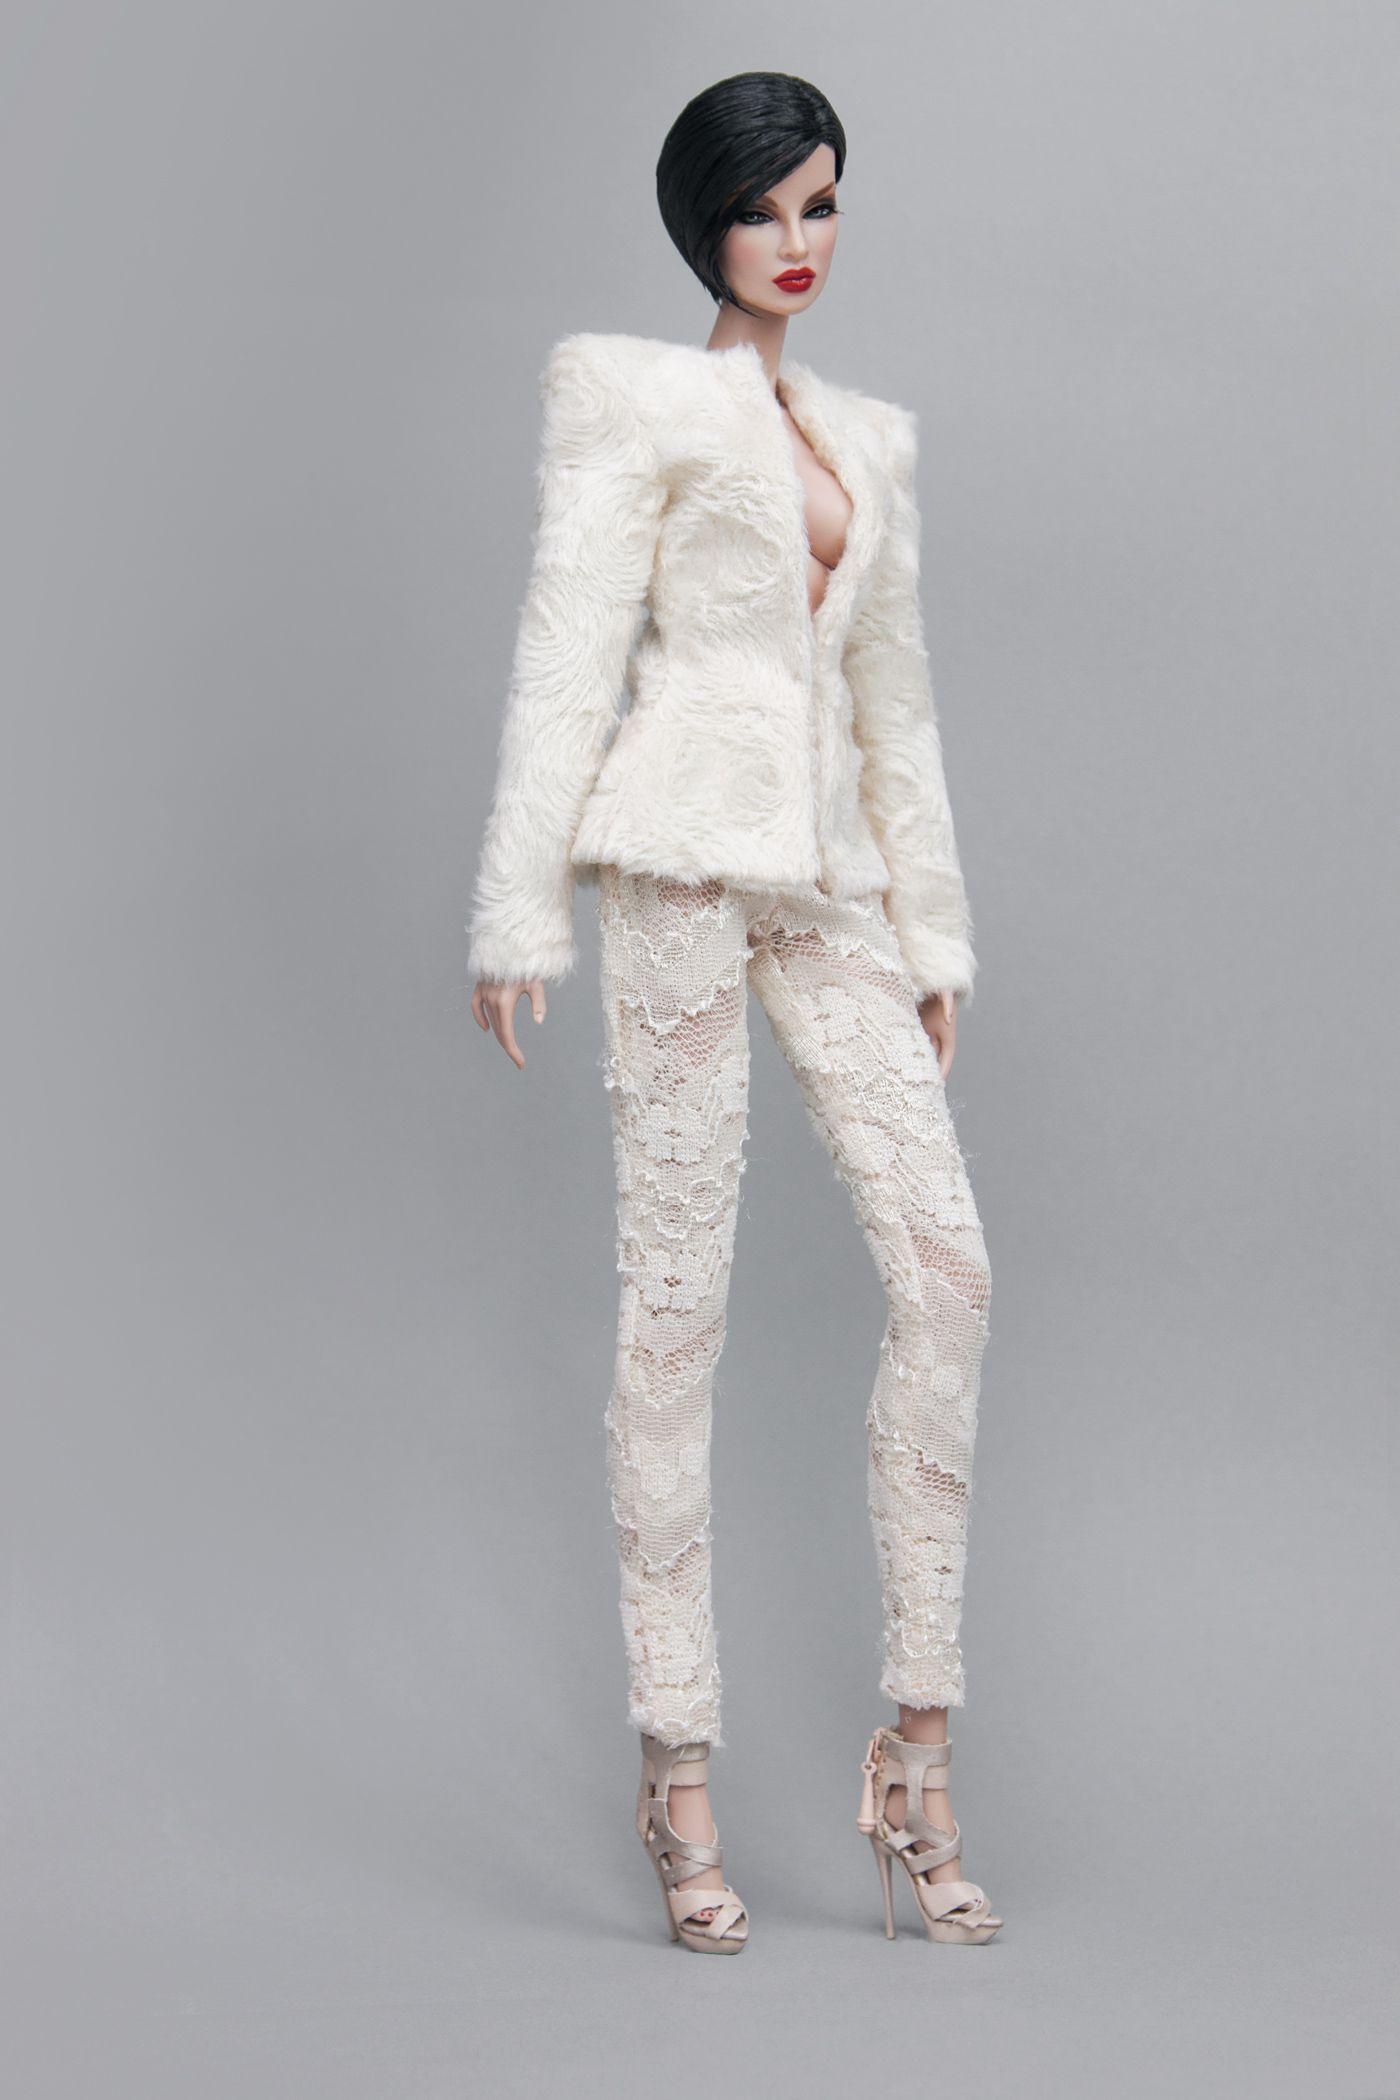 Broad Shoulder Structured Jacket In Cream Faux Fur Skinny